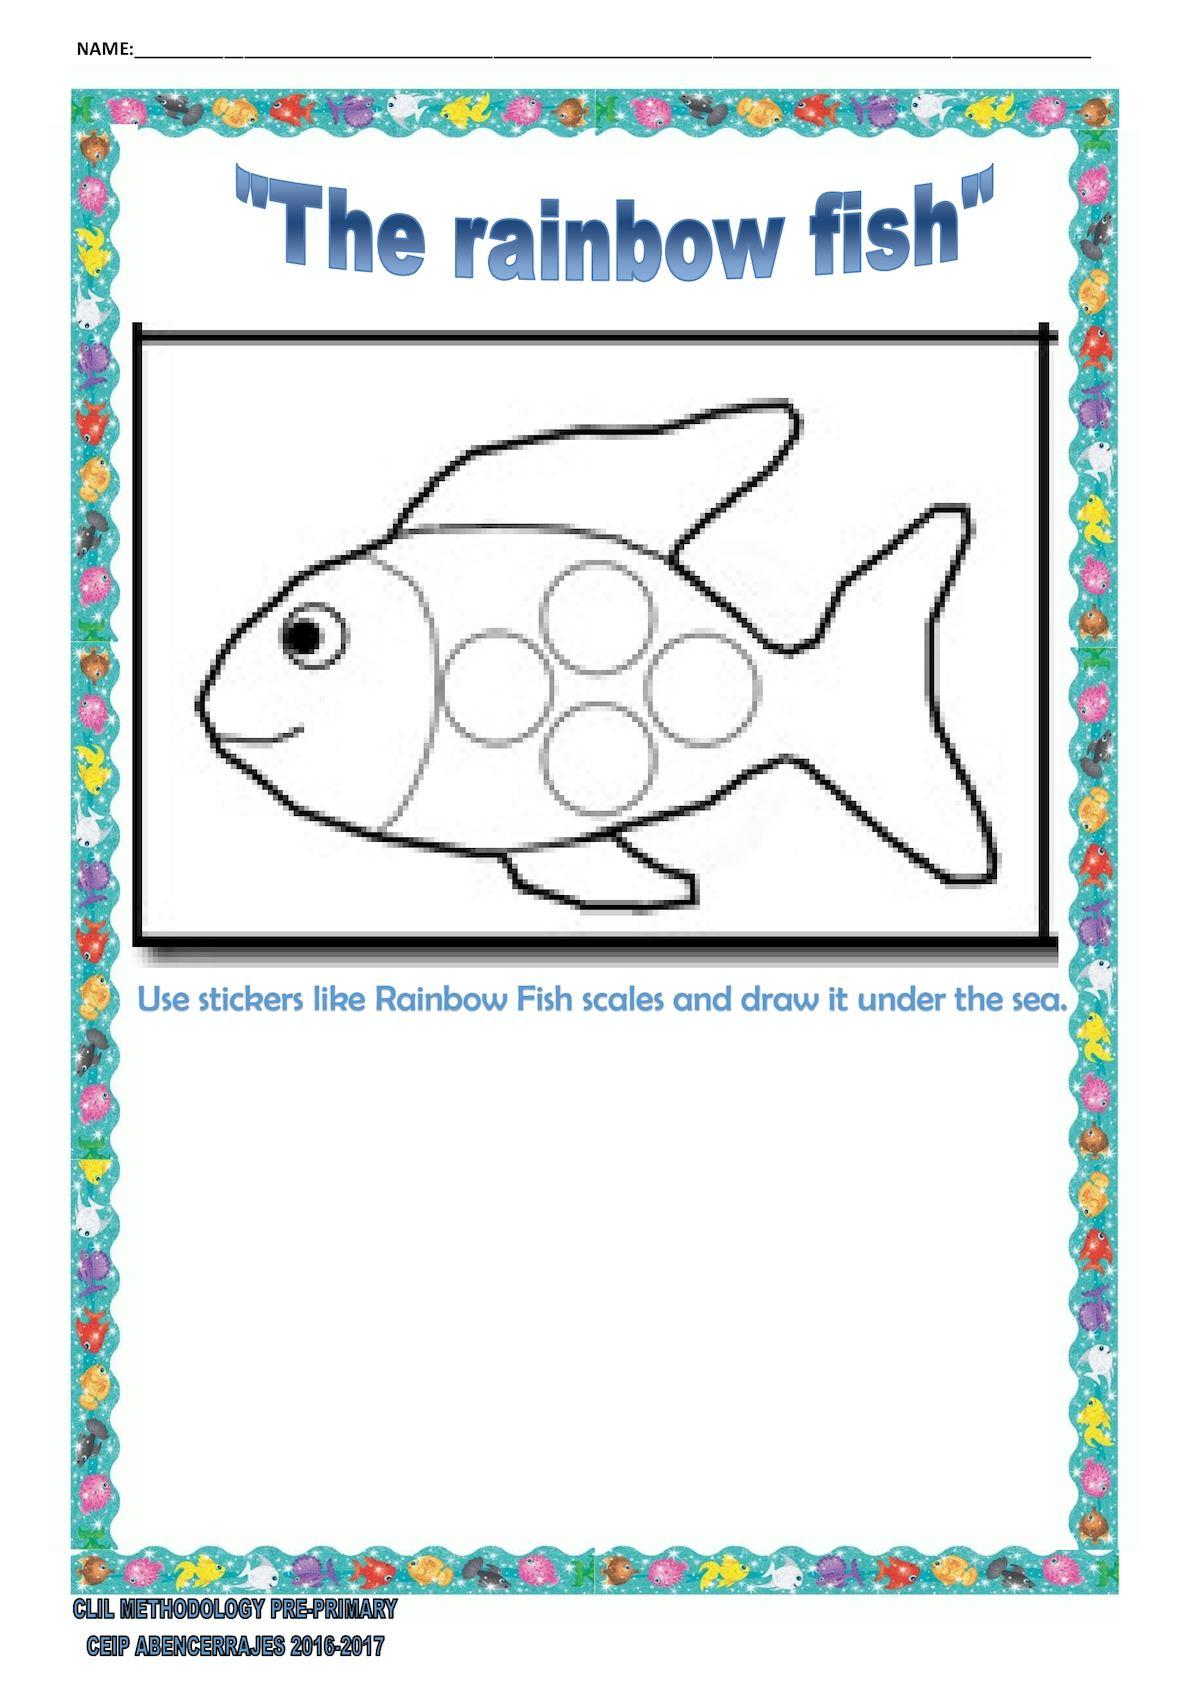 Worksheets Rainbow Fish Worksheets the rainbow fish worksheets